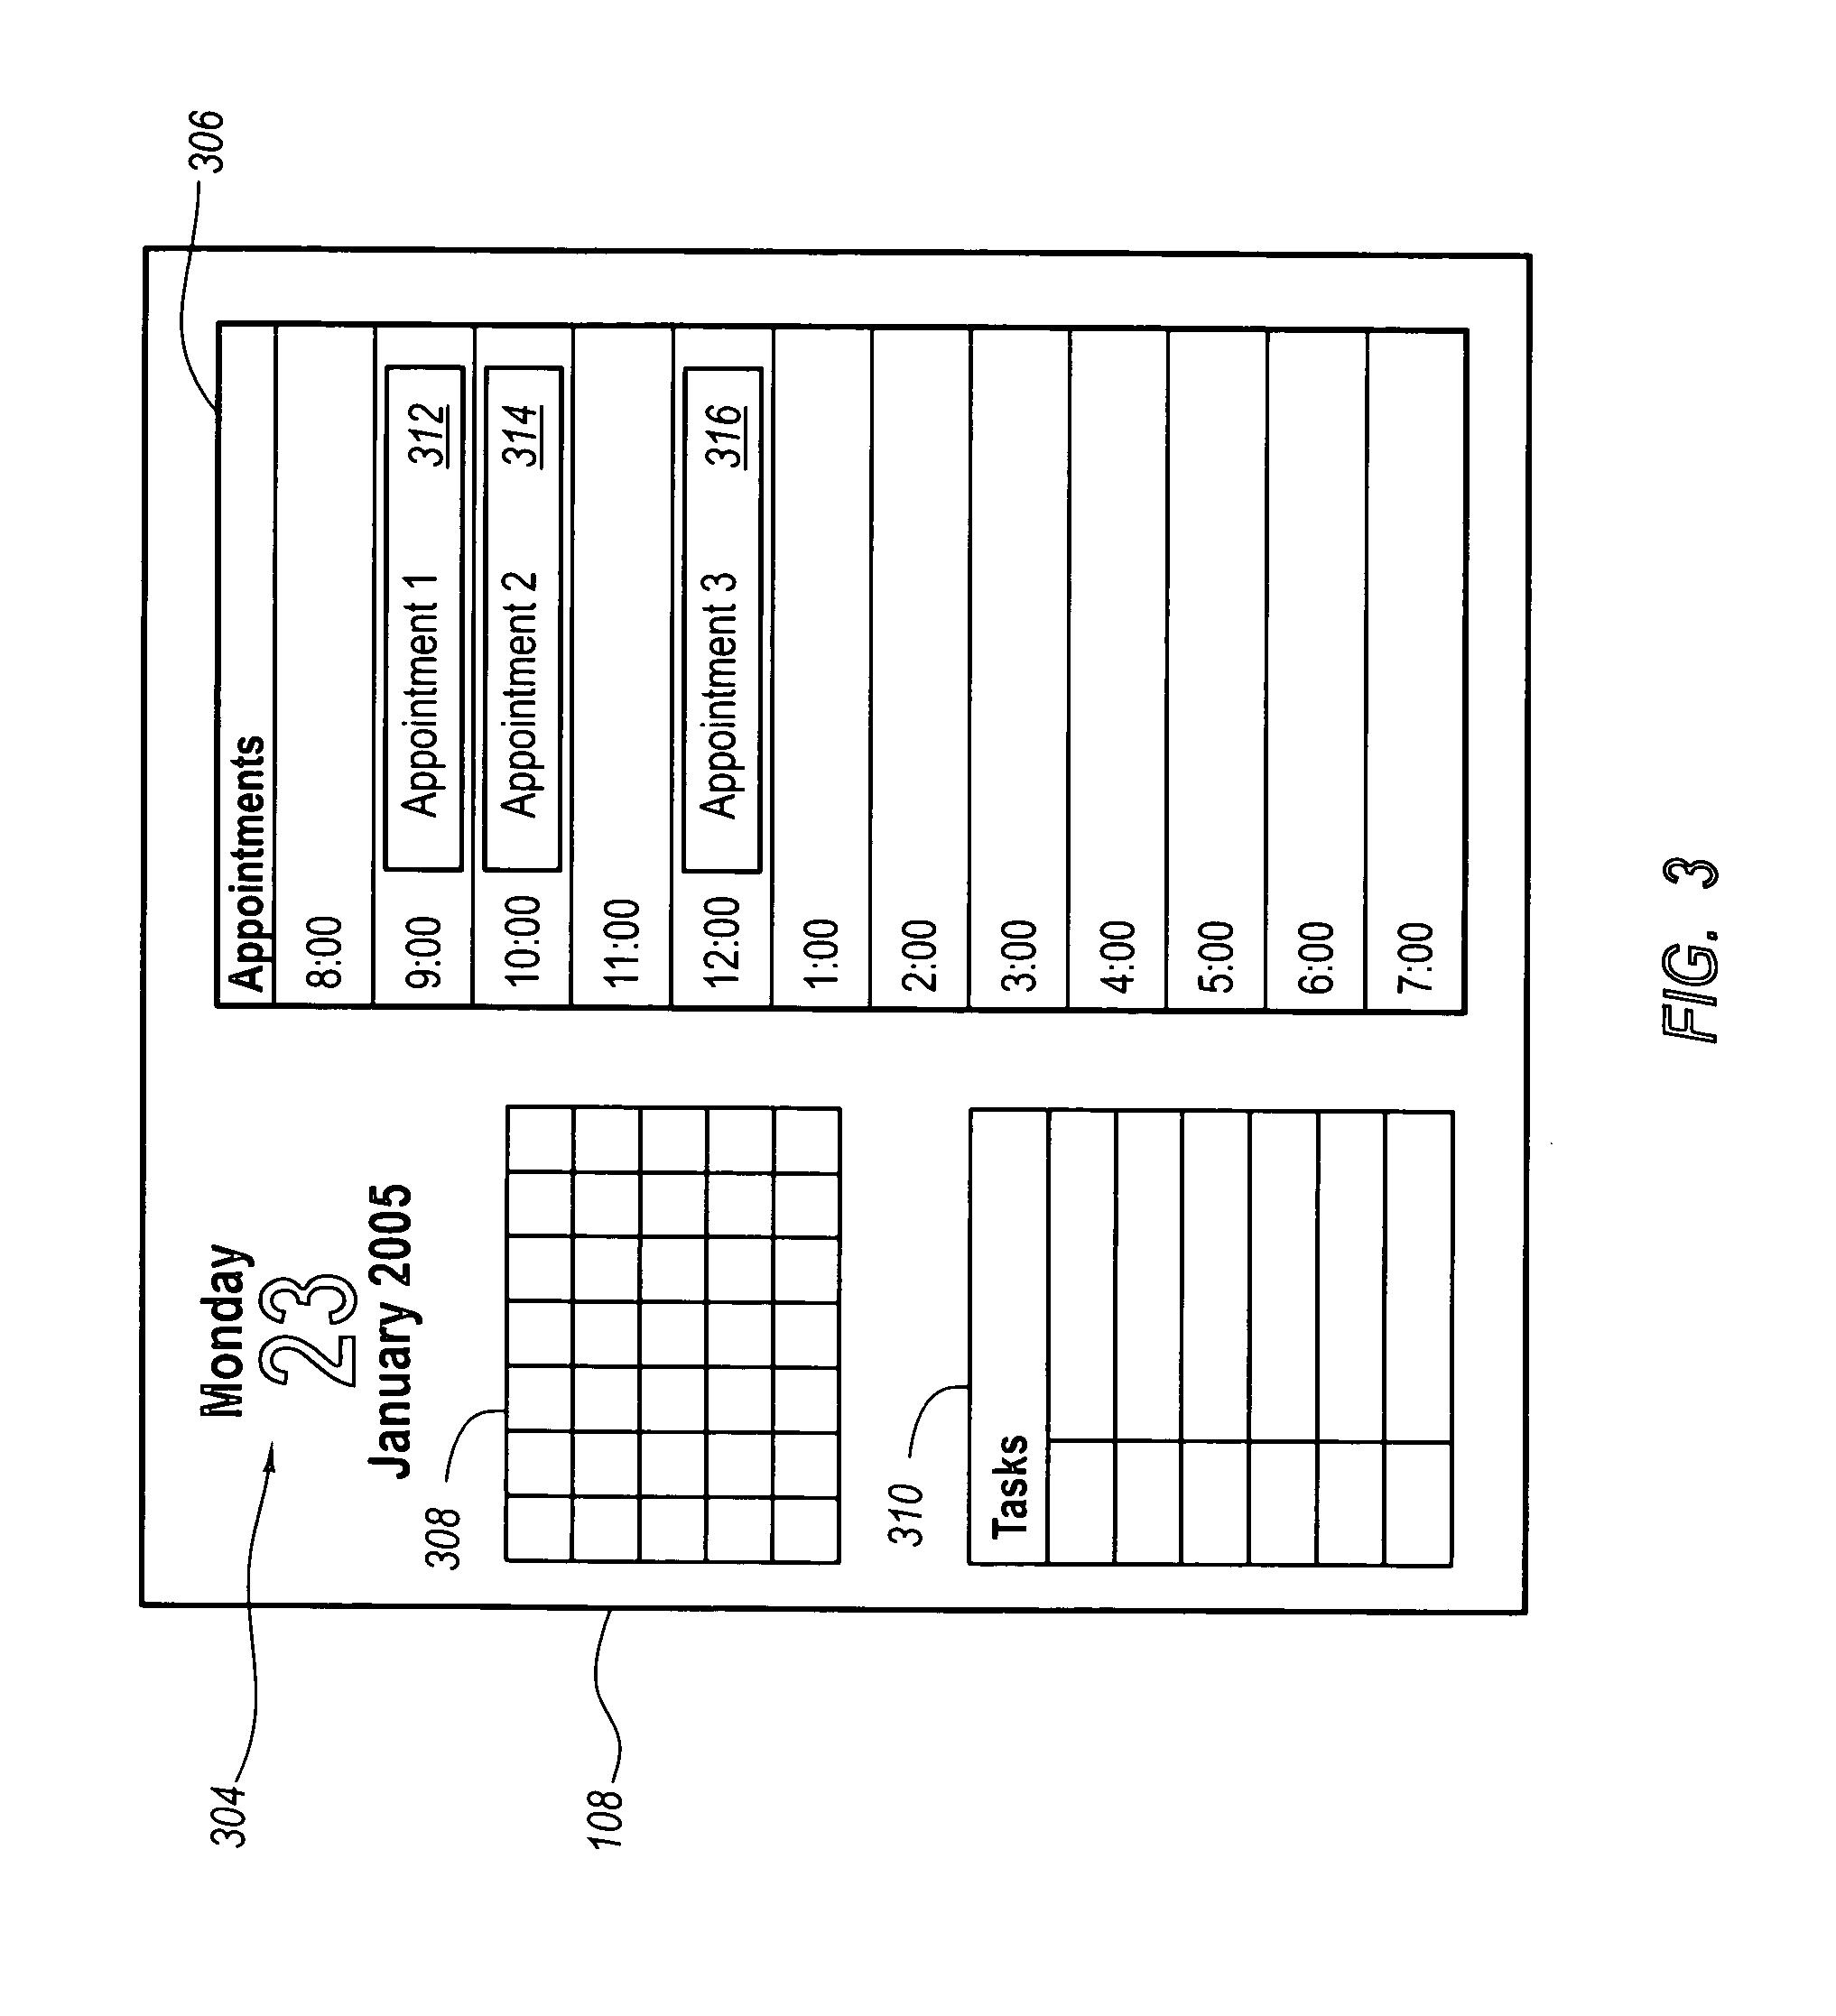 patent us20070180377 self translating template google patents. Black Bedroom Furniture Sets. Home Design Ideas